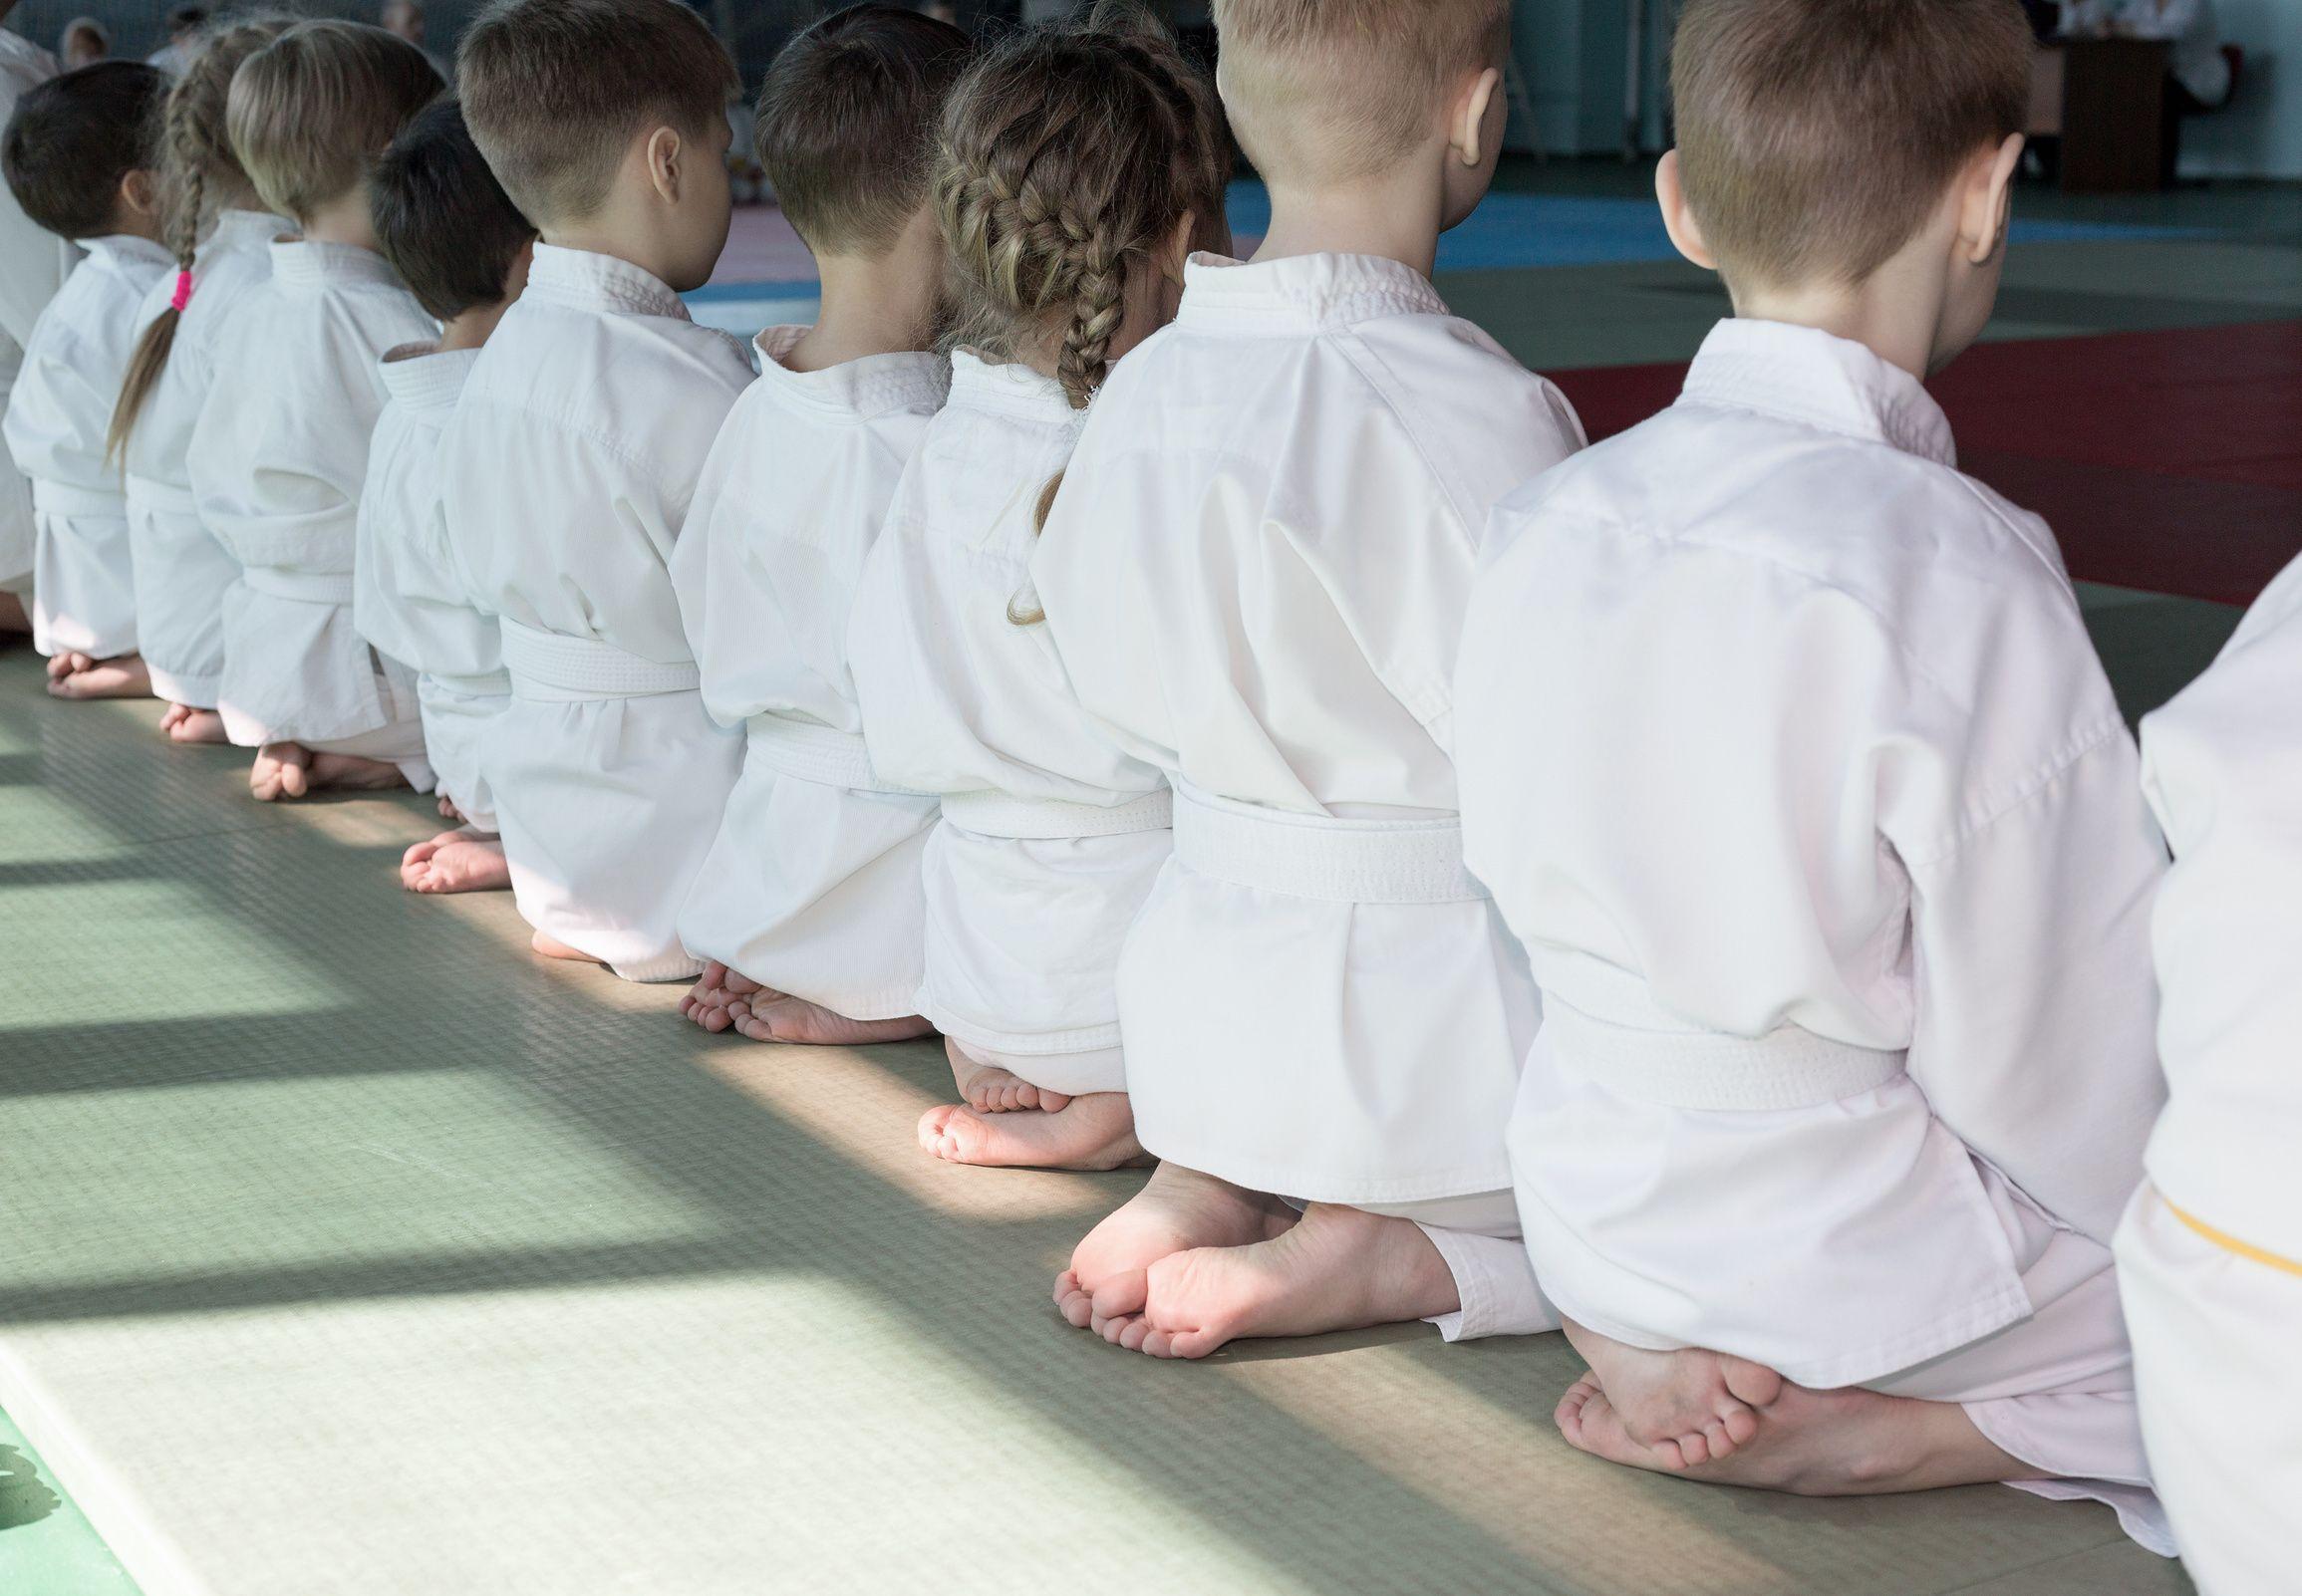 Group of children in kimono sitting on tatami on martial arts training seminar